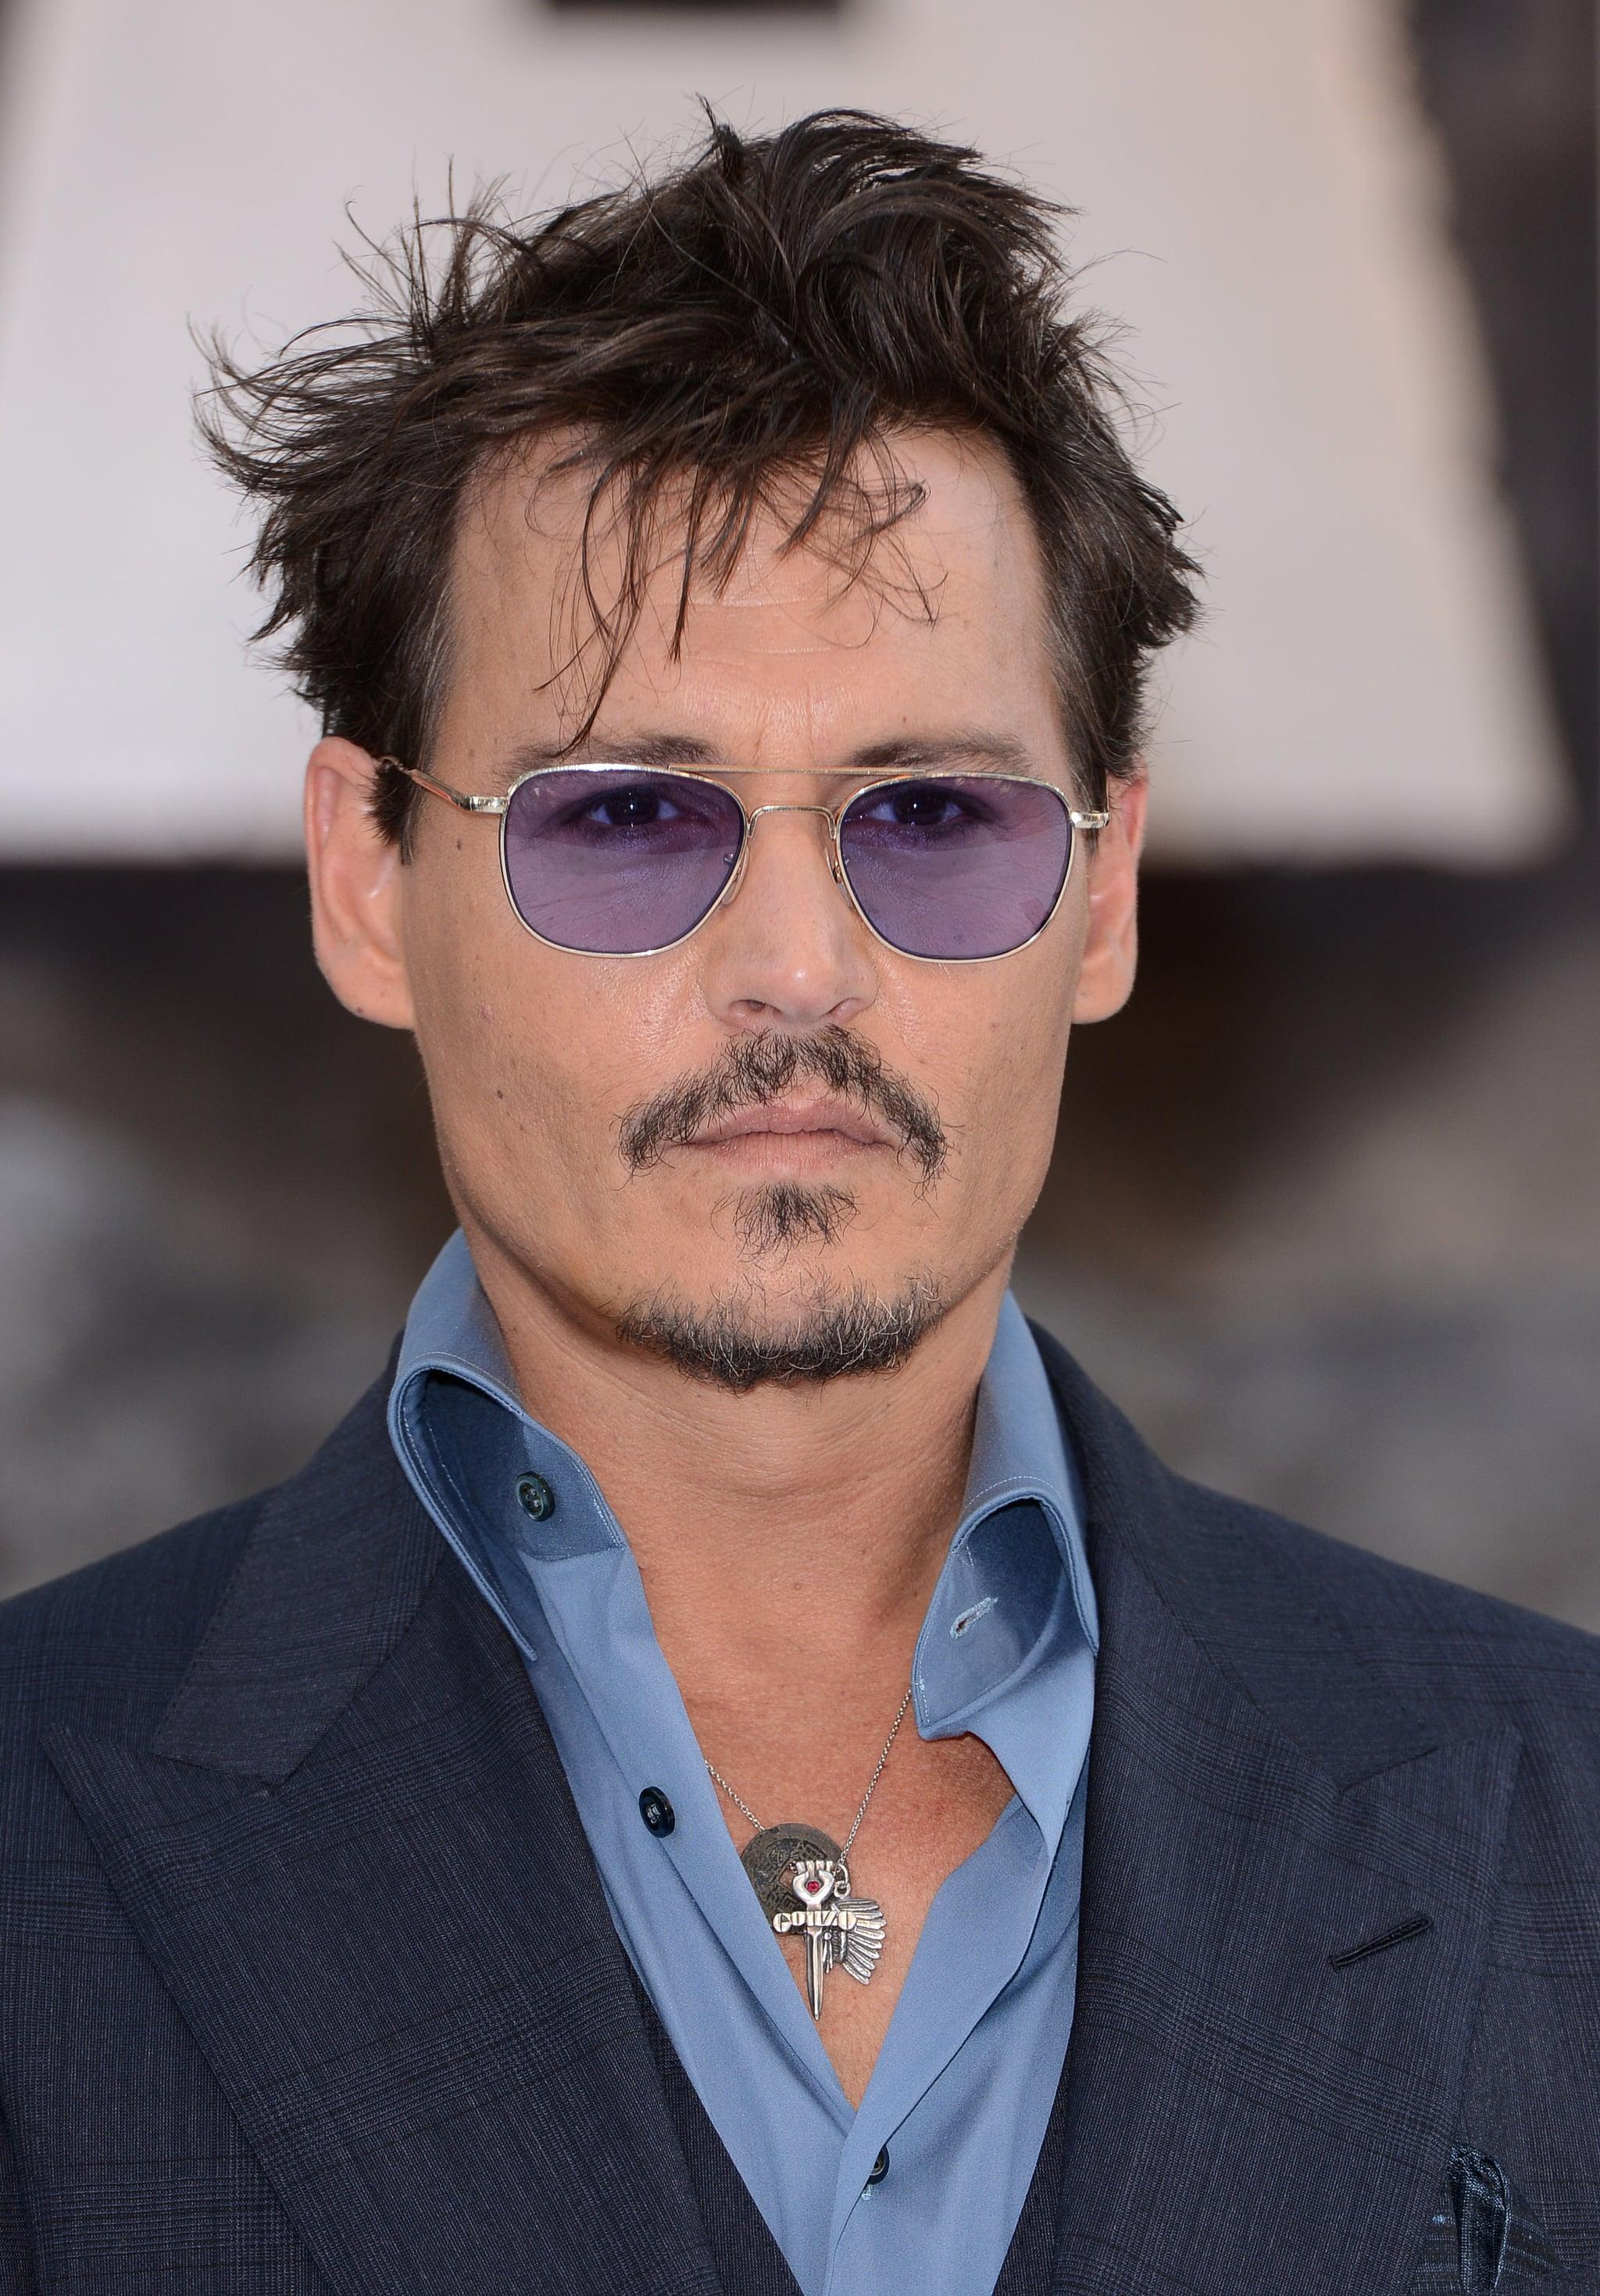 Johnny Depp: The Skinny 'Stache Beard